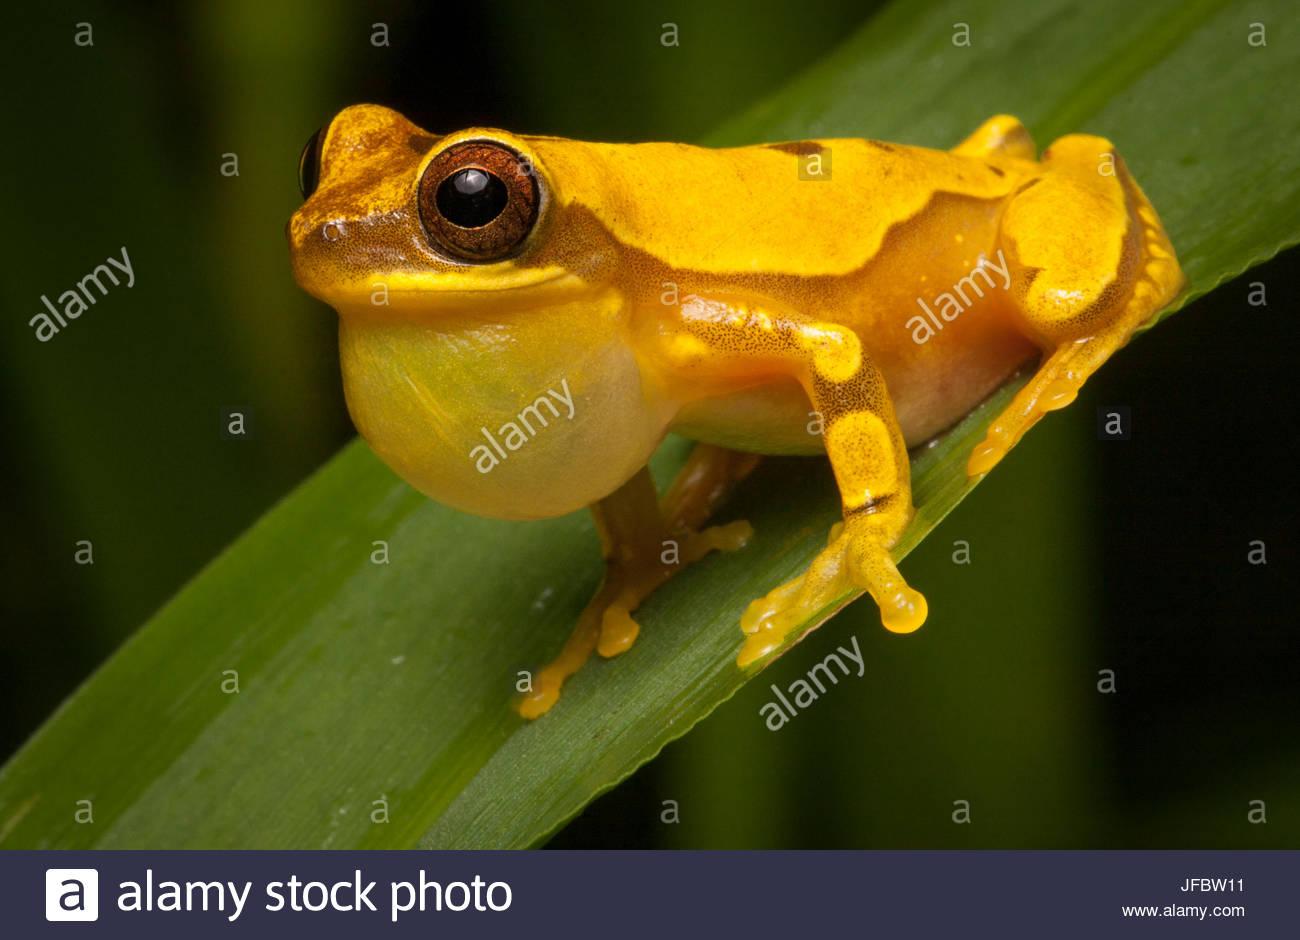 Portrait of a hourglass frog, Dendropsophus ebraccatus, calling. - Stock Image